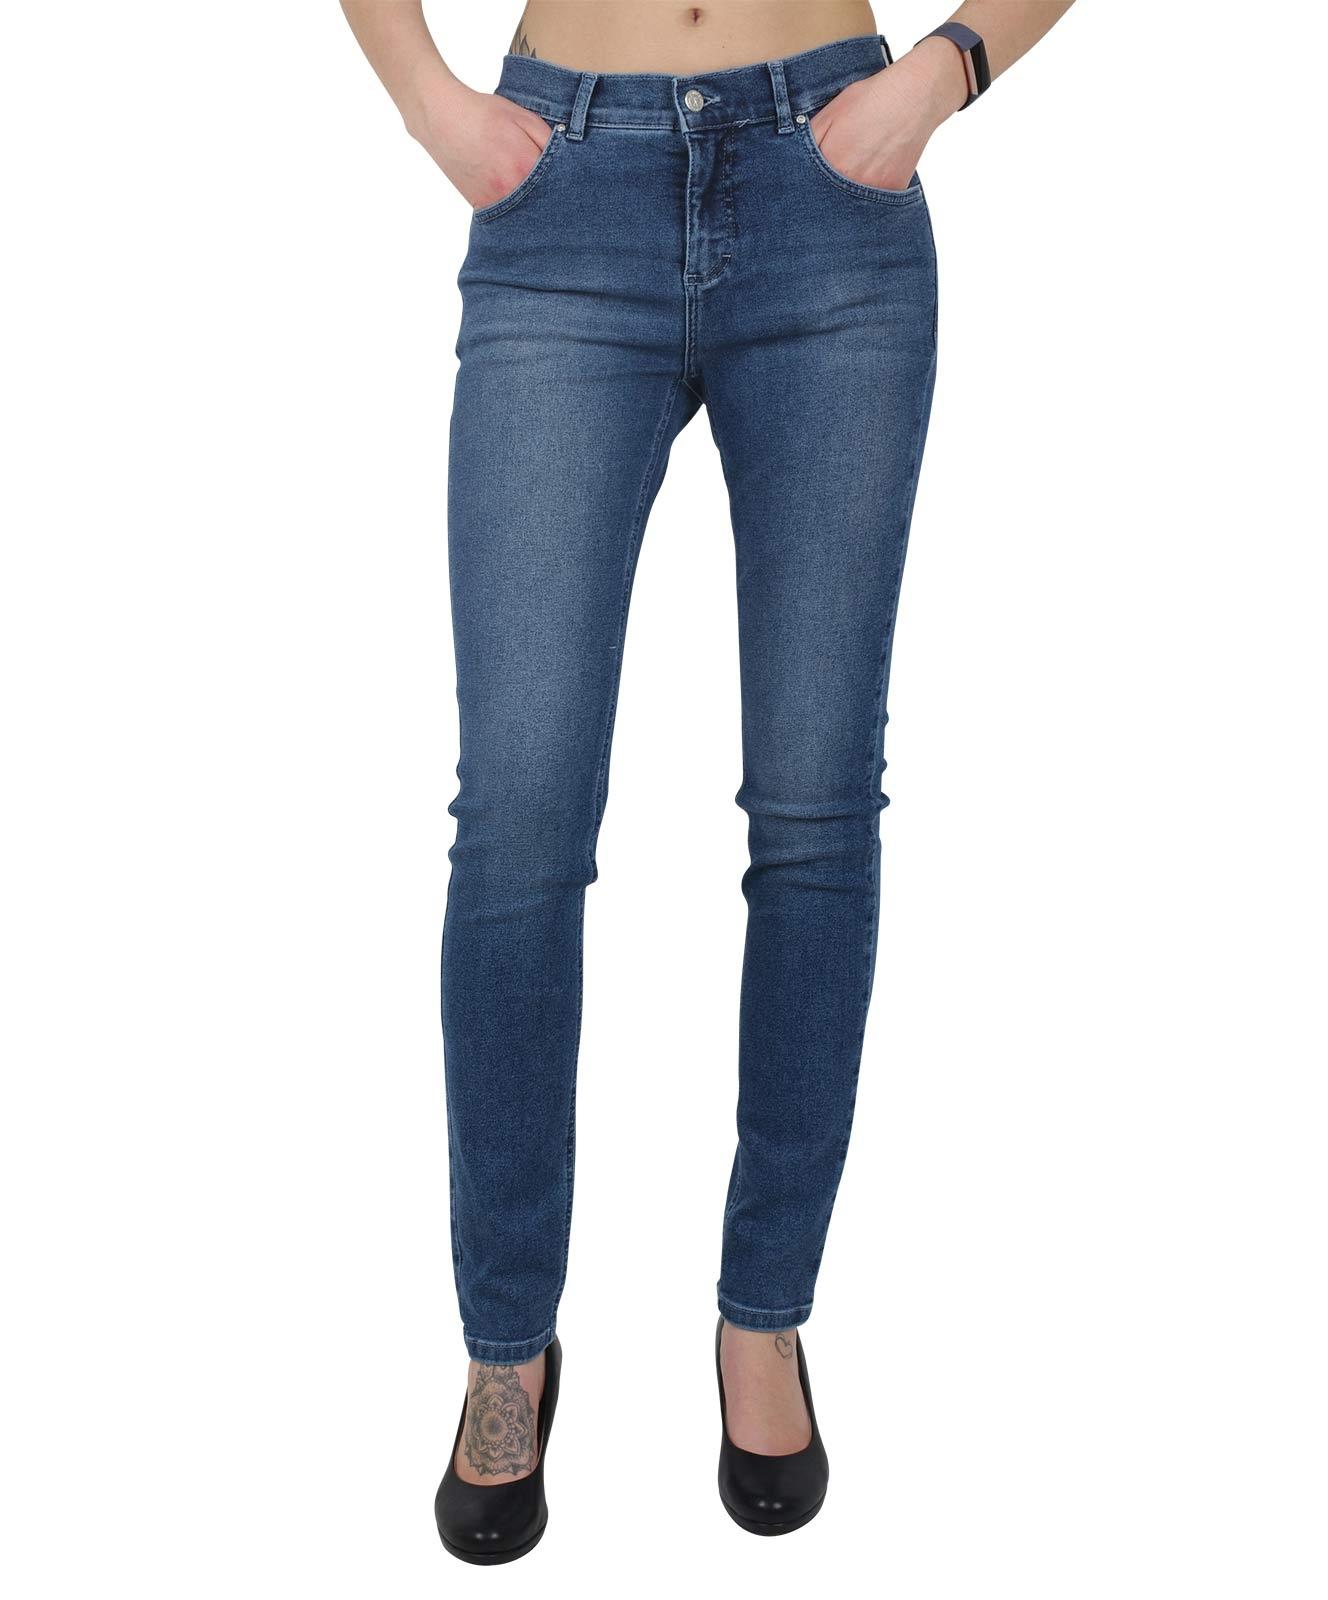 Hosen - Angels Jeans Röhre Skinny in Mid Blue Used  - Onlineshop Jeans Meile